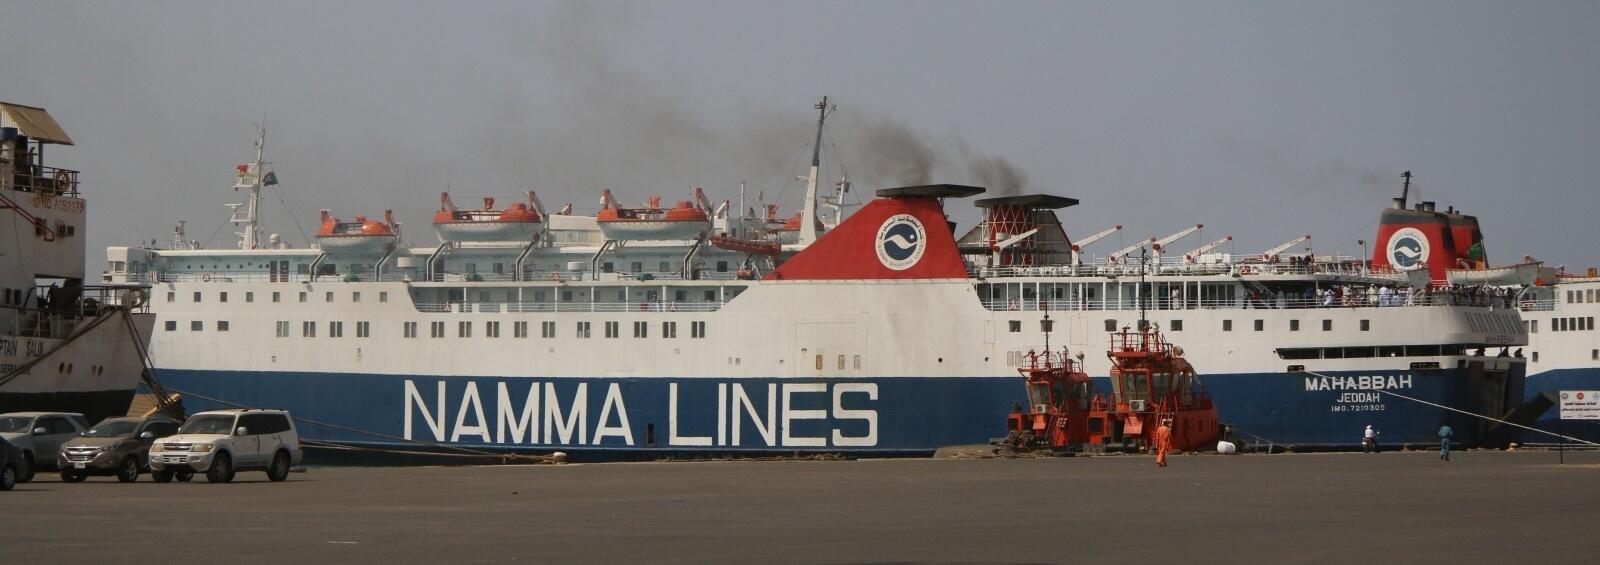 Ferry from Port Sudan to Saudi Arabia